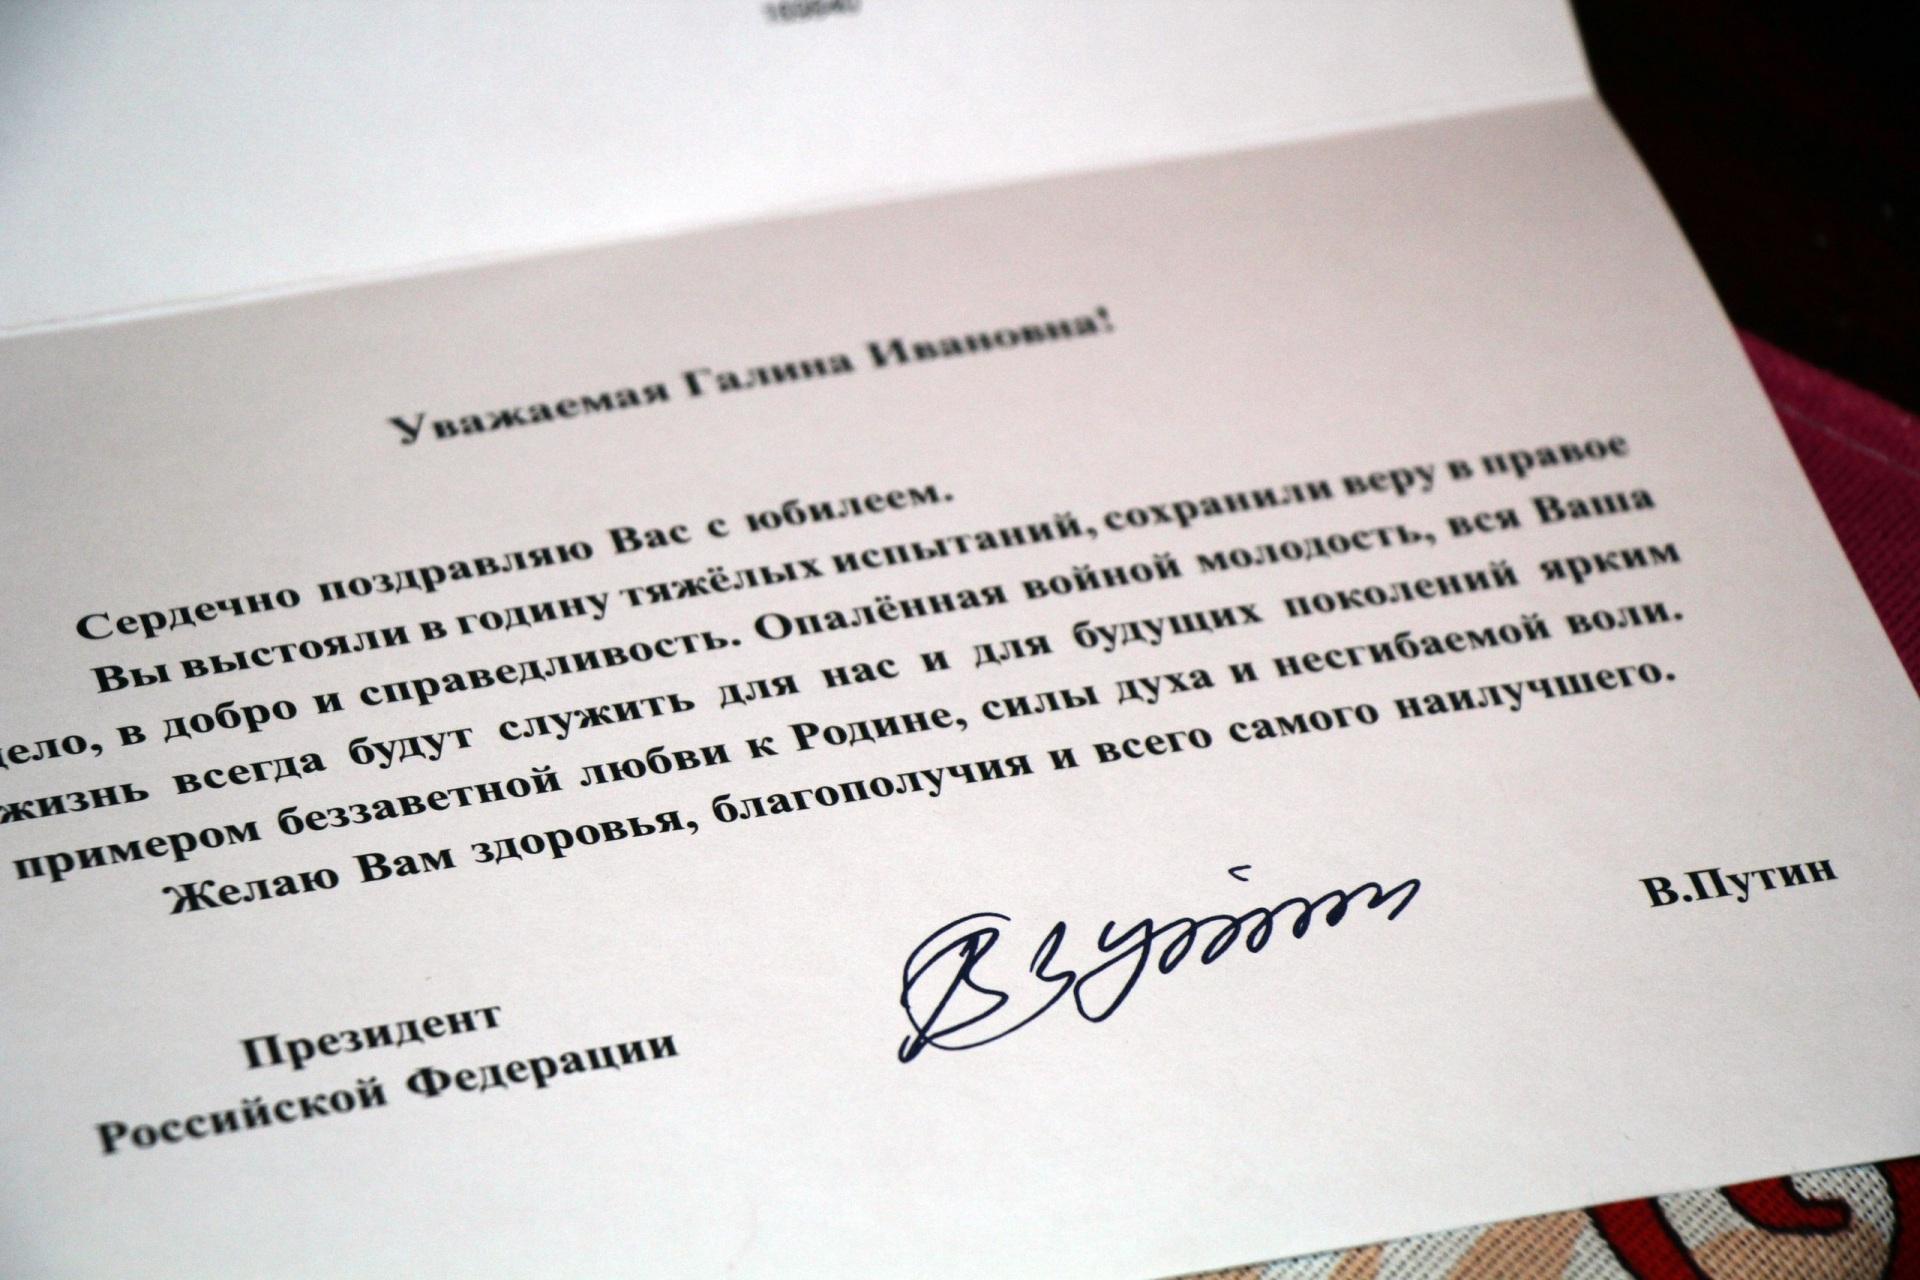 Интинку Галину Лушкову с 90-летием поздравил президент России